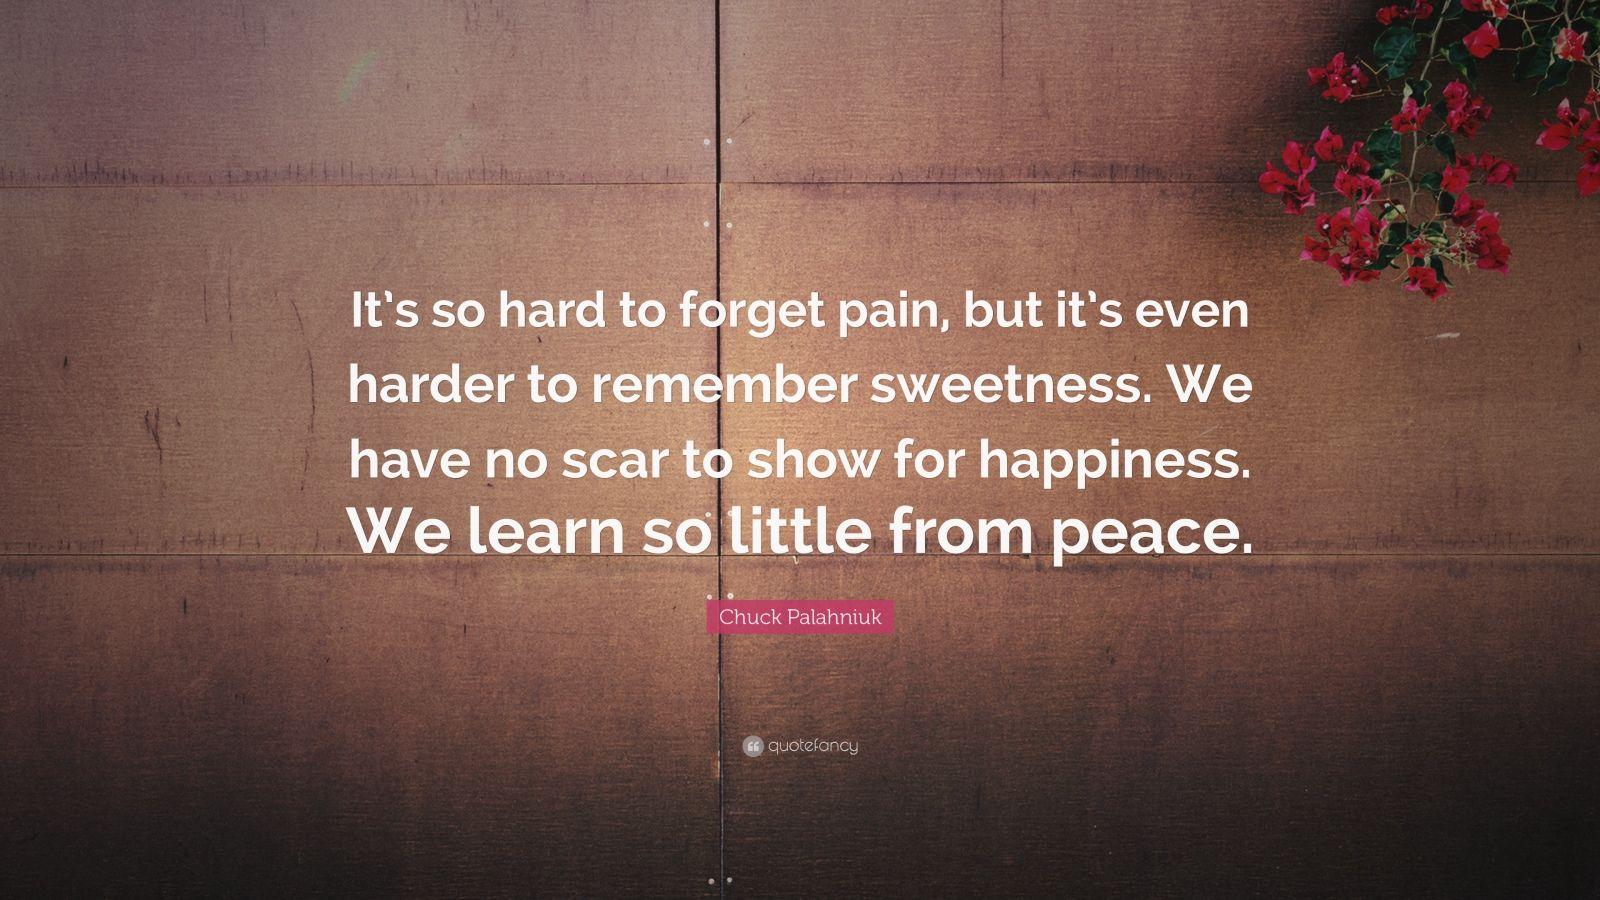 Chuck Palahniuk Quotes Wallpapers   Inspirational e quotescom 1600x900